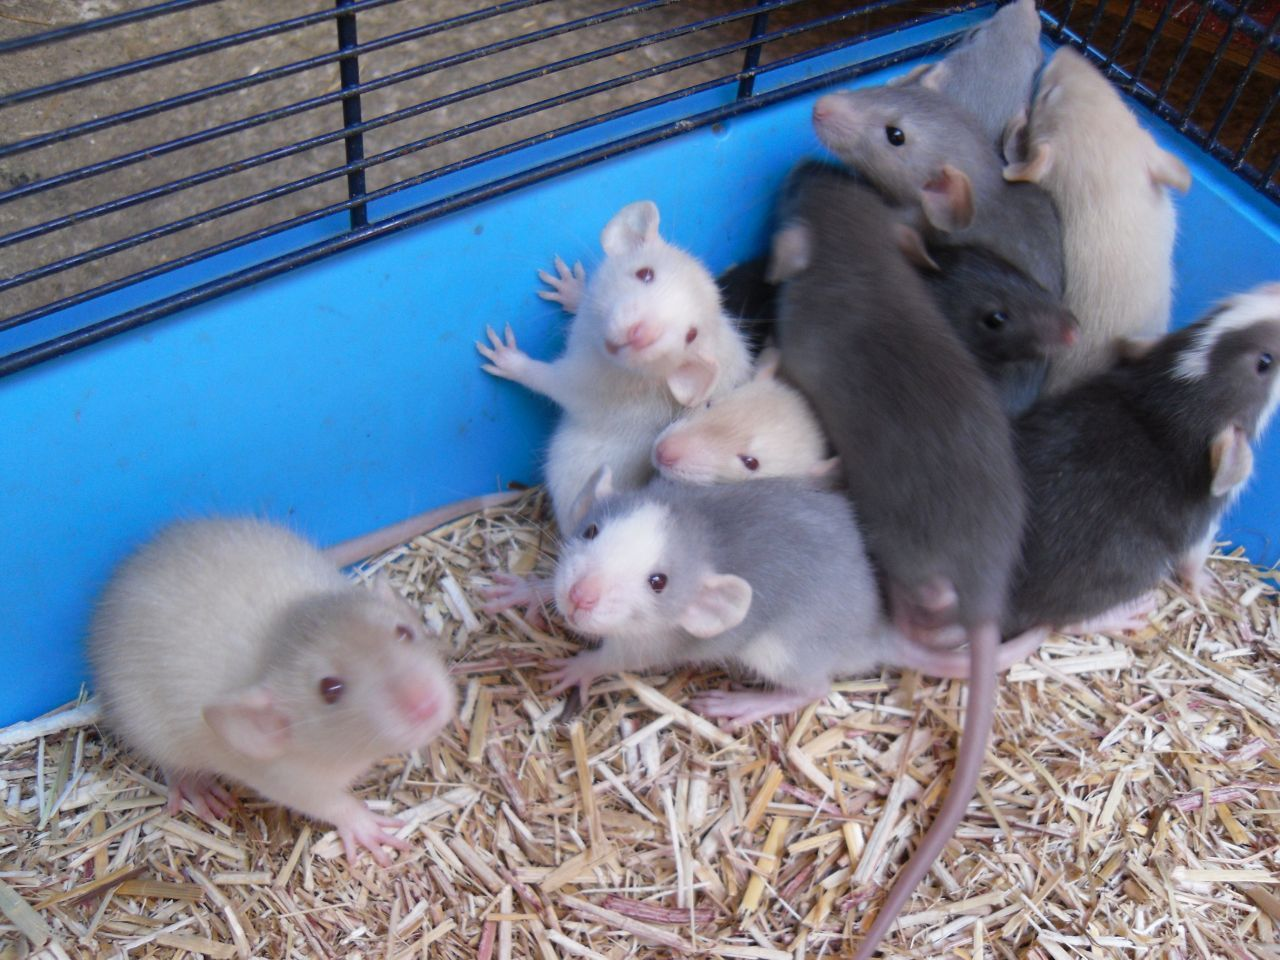 Pin by Raven Nyx MjW on Adorable Pet Rats Dumbo rat, Pet